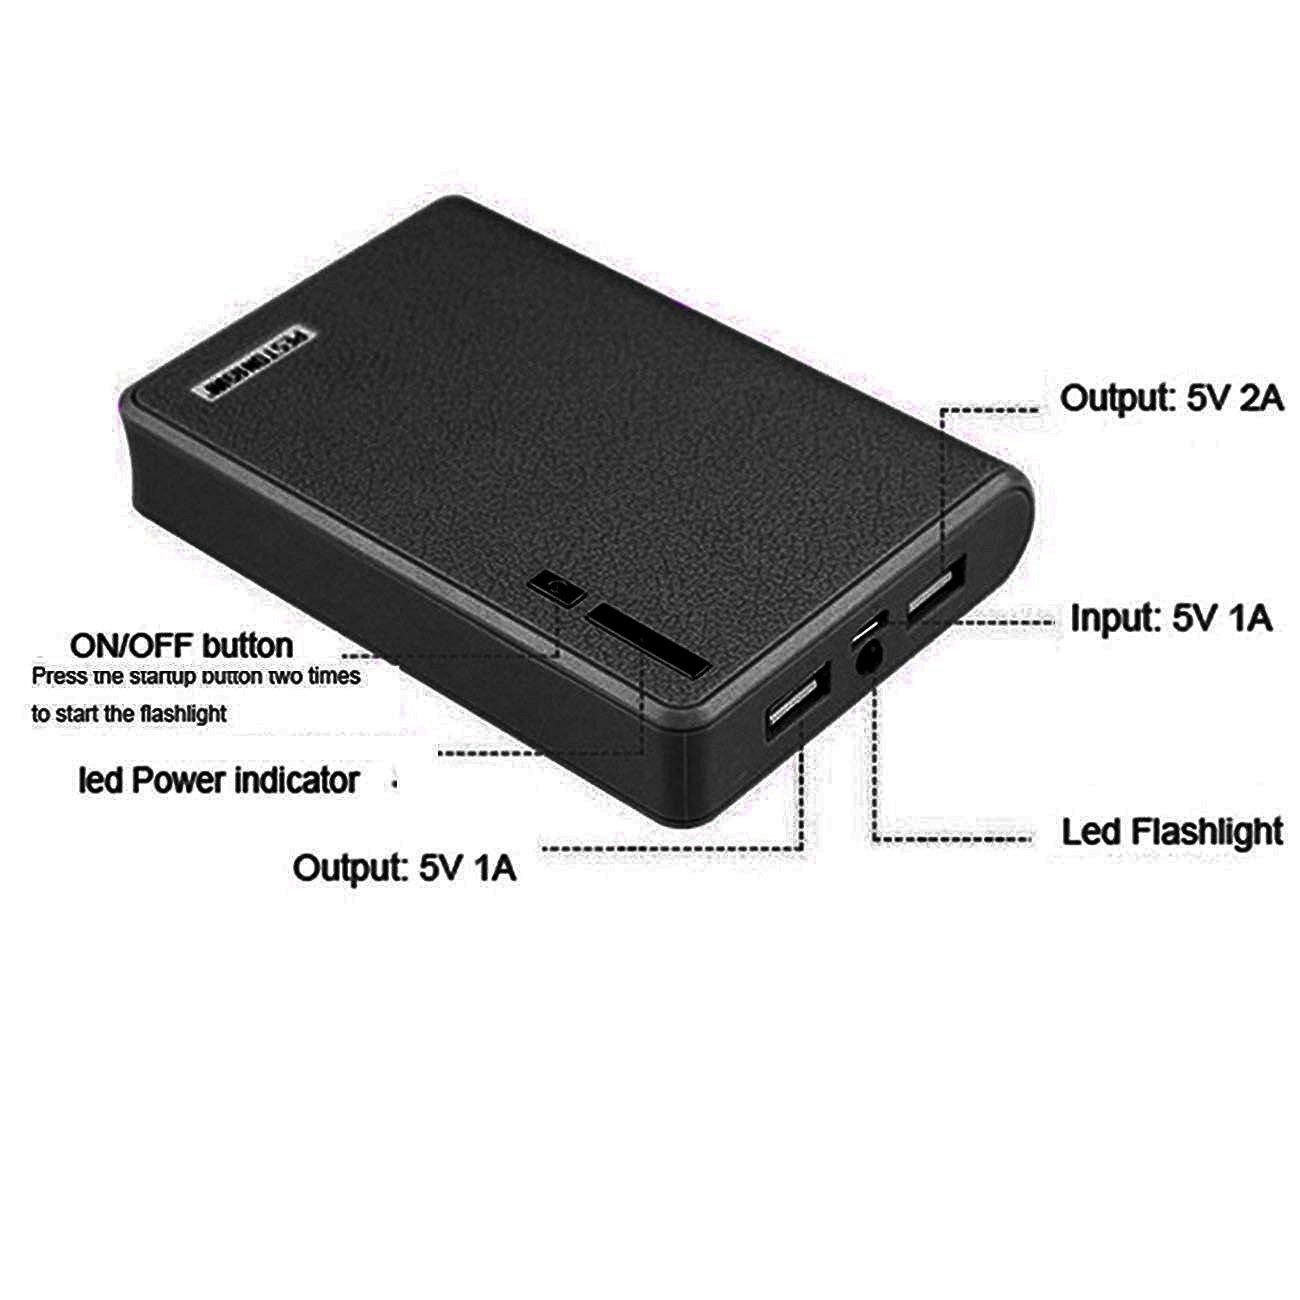 Amazon.com: 12000mAh Portable Charger External Battery Power ...